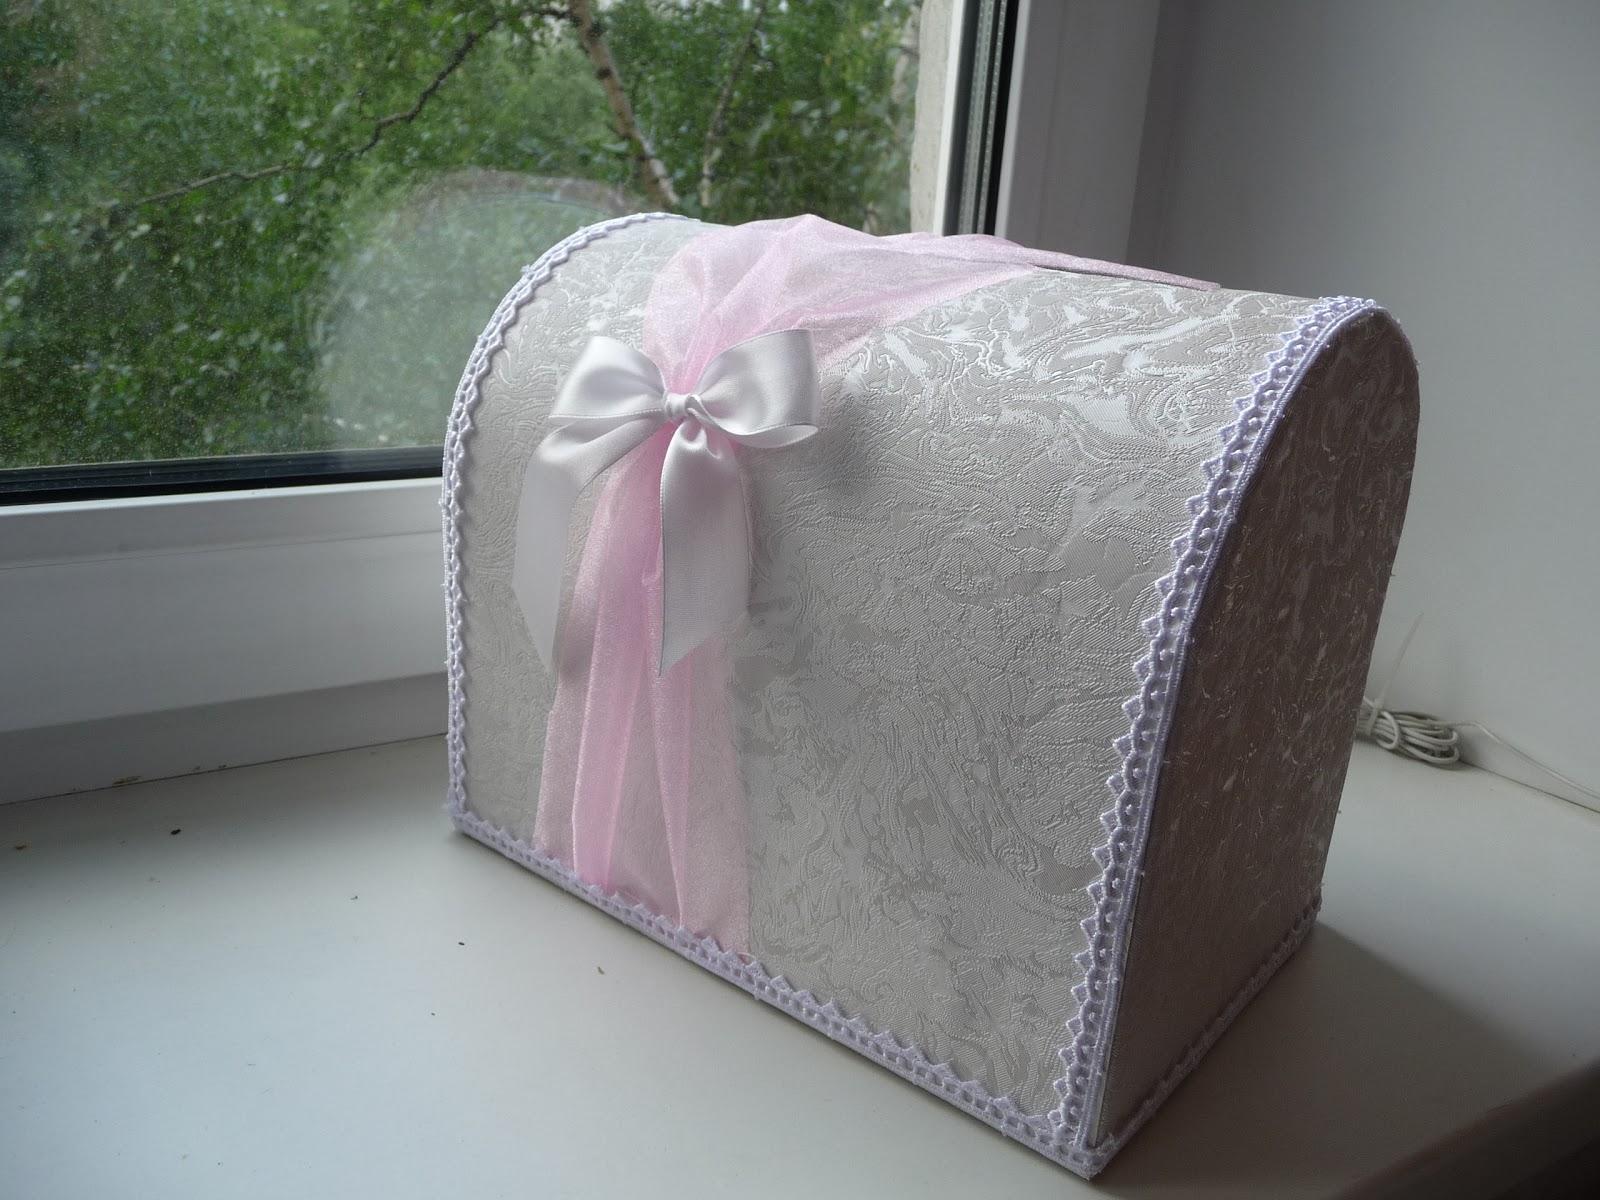 Казна на свадьбу своими руками фото из коробки 14